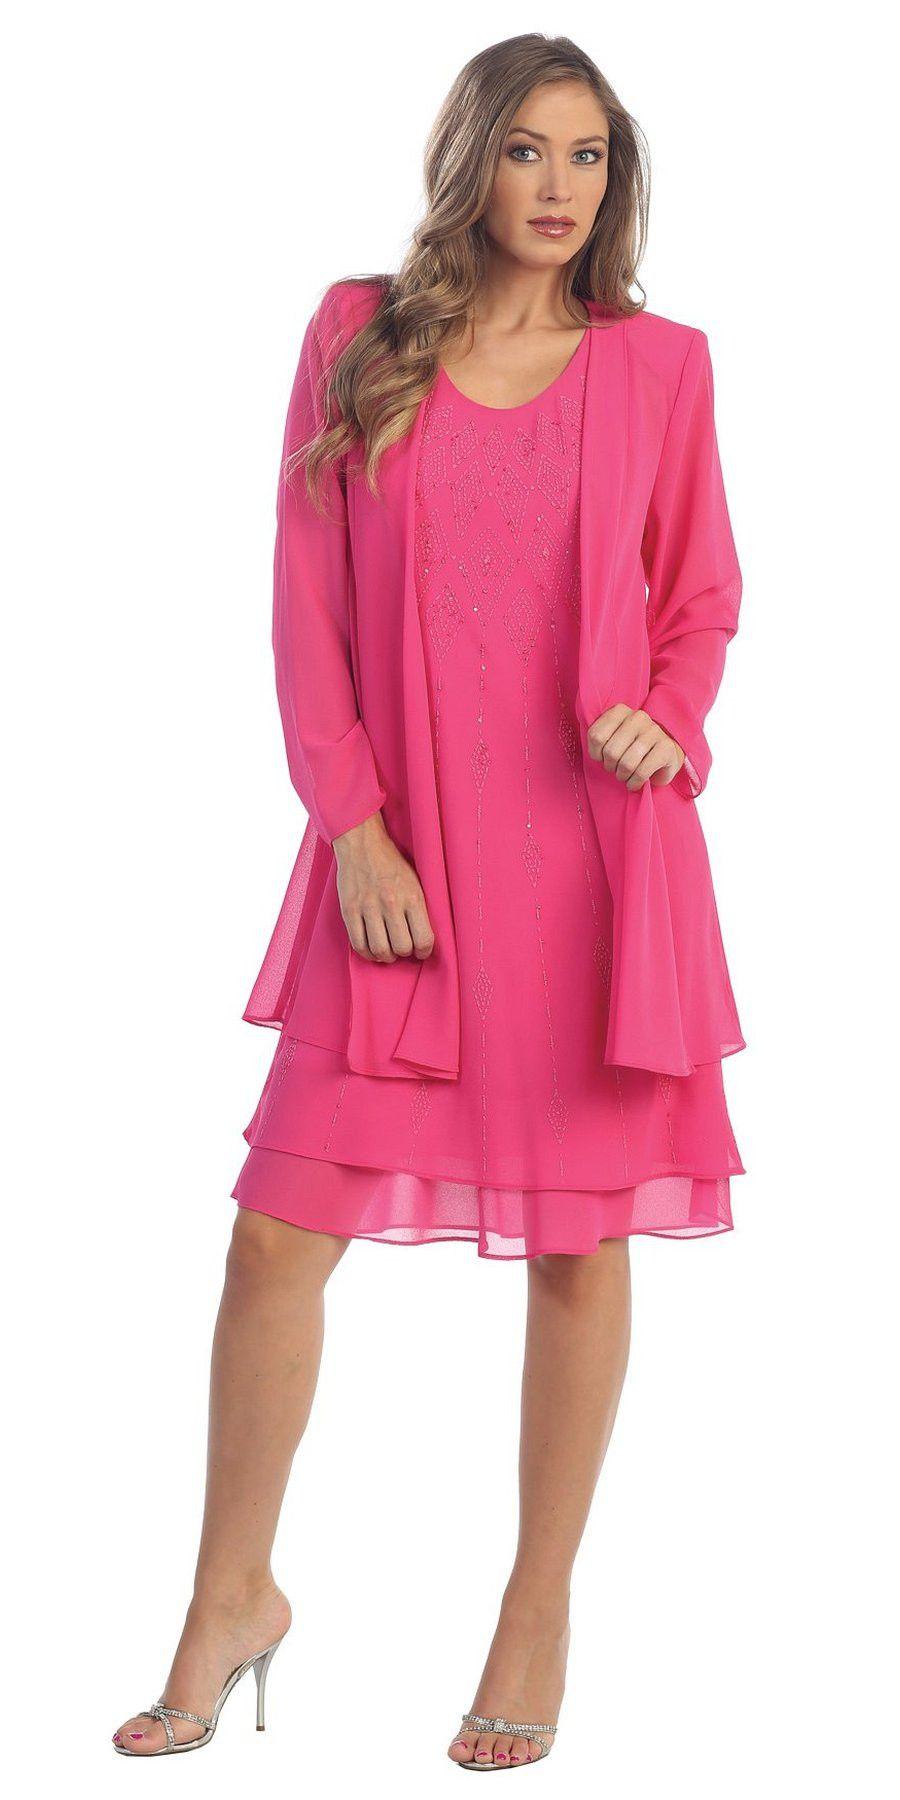 Flowy Chiffon Fuchsia Dress Knee Length Long Sleeve Cardigan ...